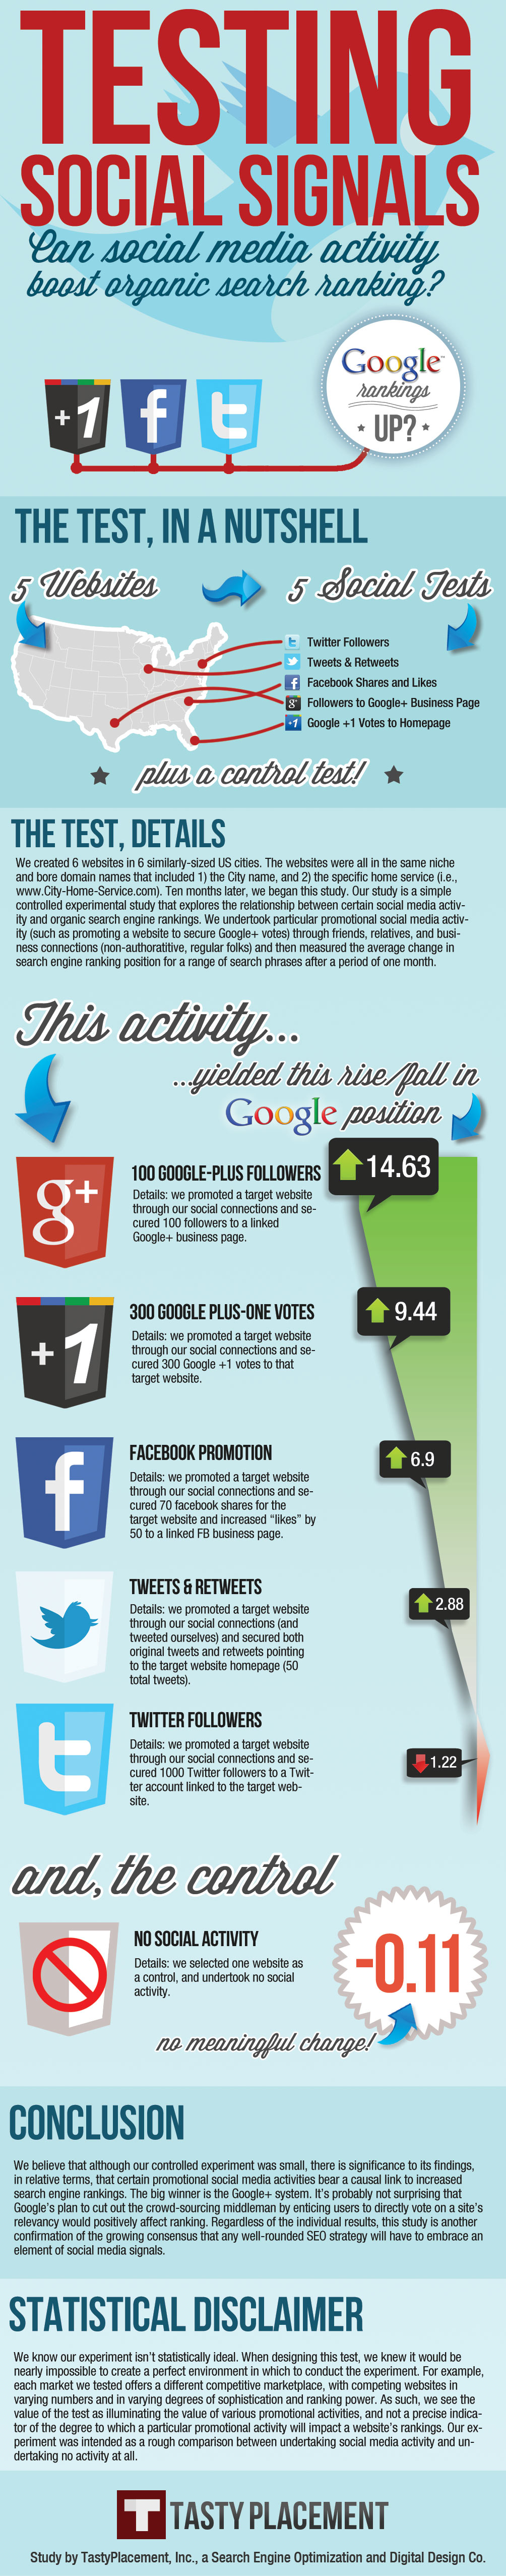 Google Plus Infographic Testing Social Signals